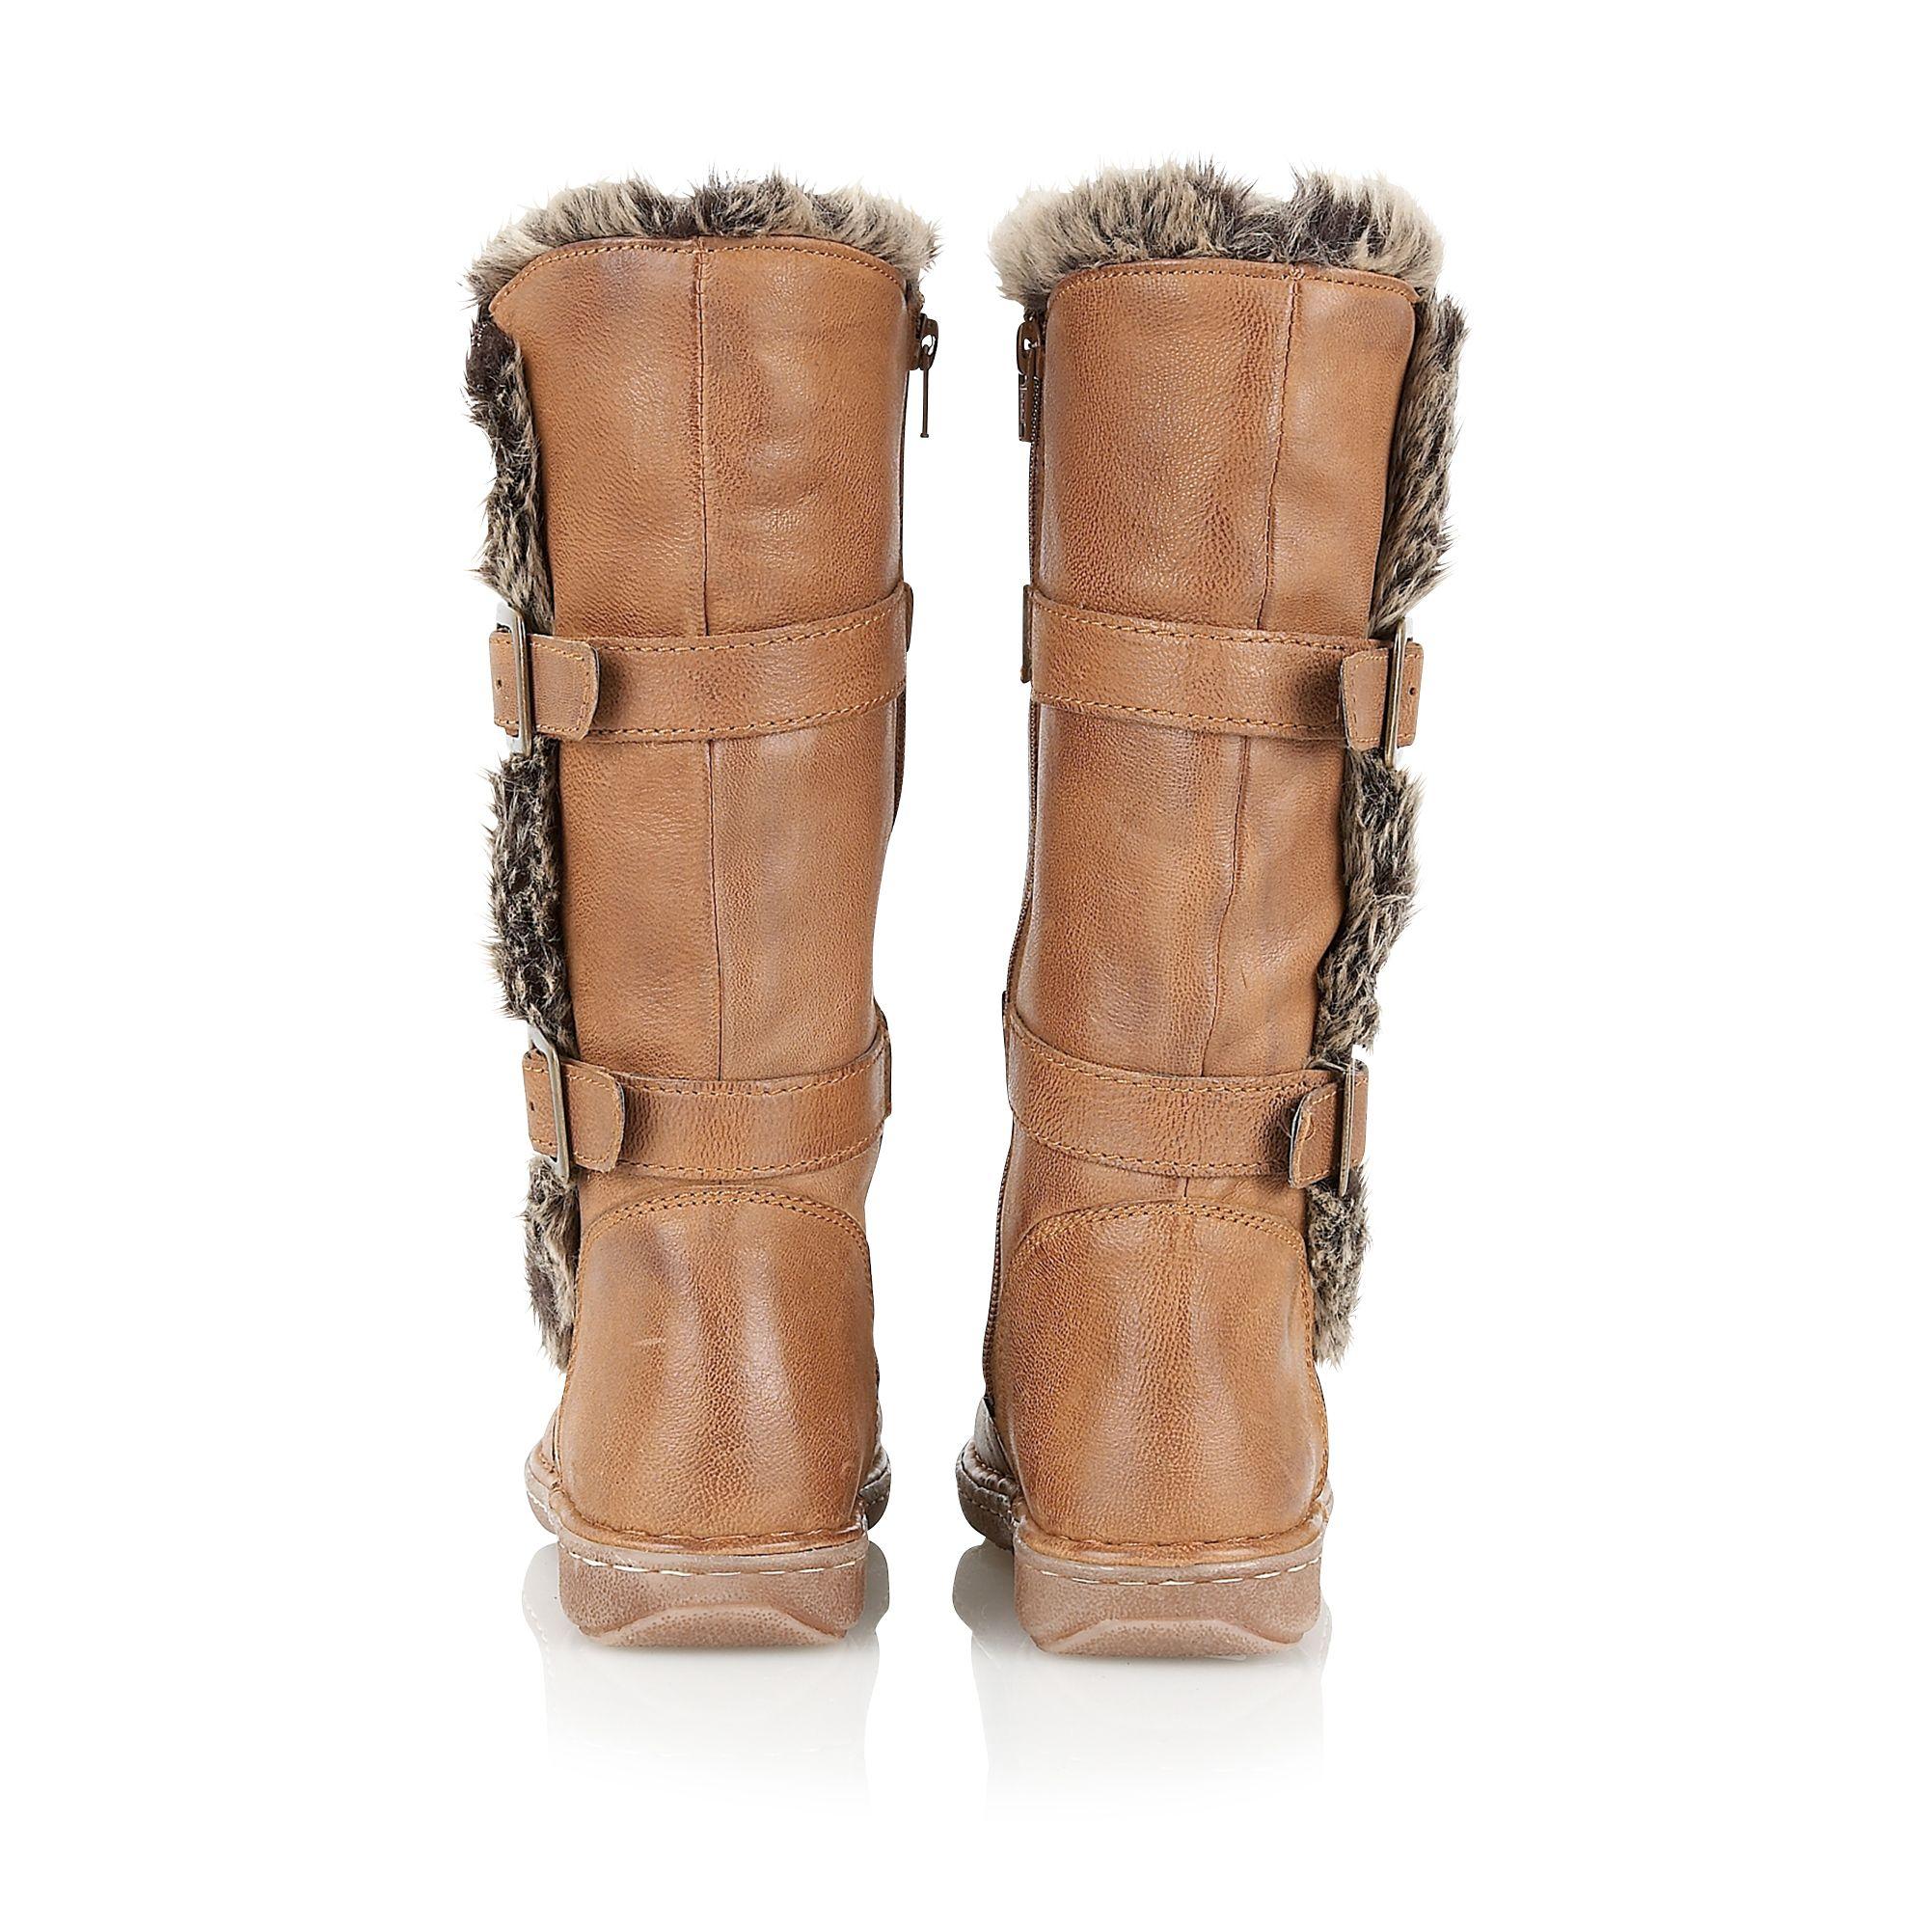 Lotus Leather Sard Casual Boots in Tan (Brown)